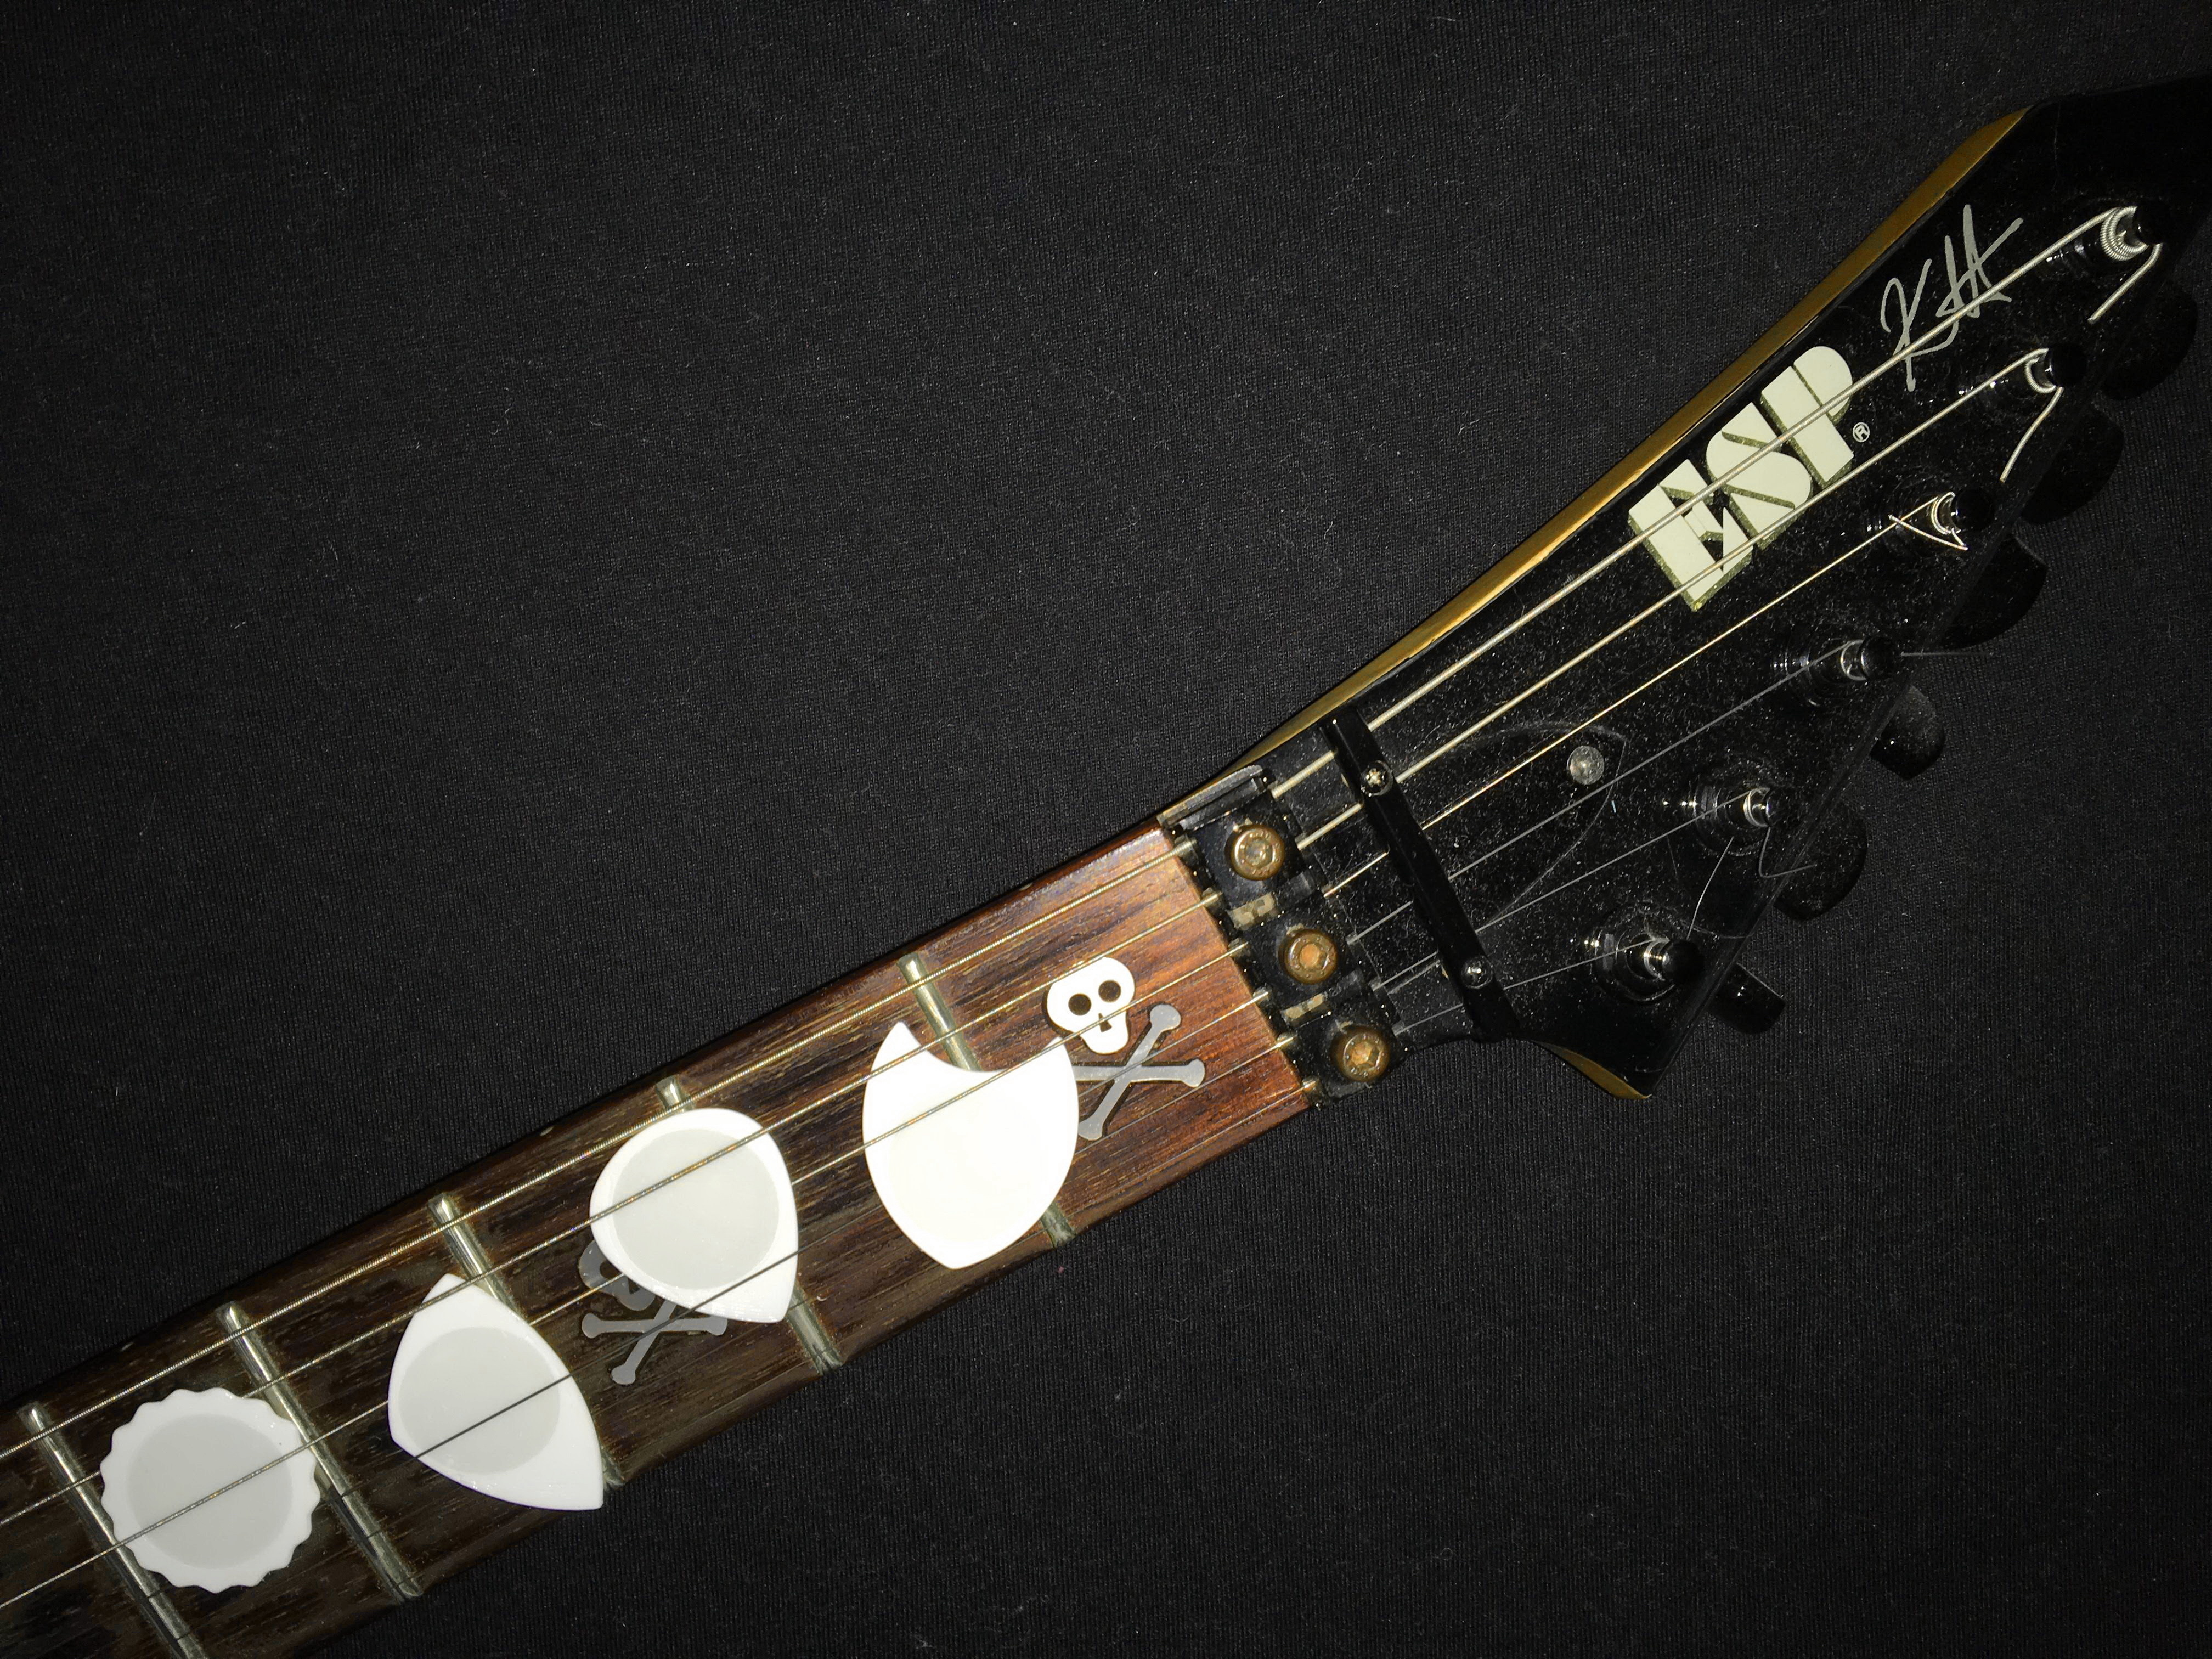 PITA DUA RADON UNU guitar ESP Km.JPG Download free STL file PITA R9'5 23X36 pua electric guitar • 3D printable design, carleslluisar